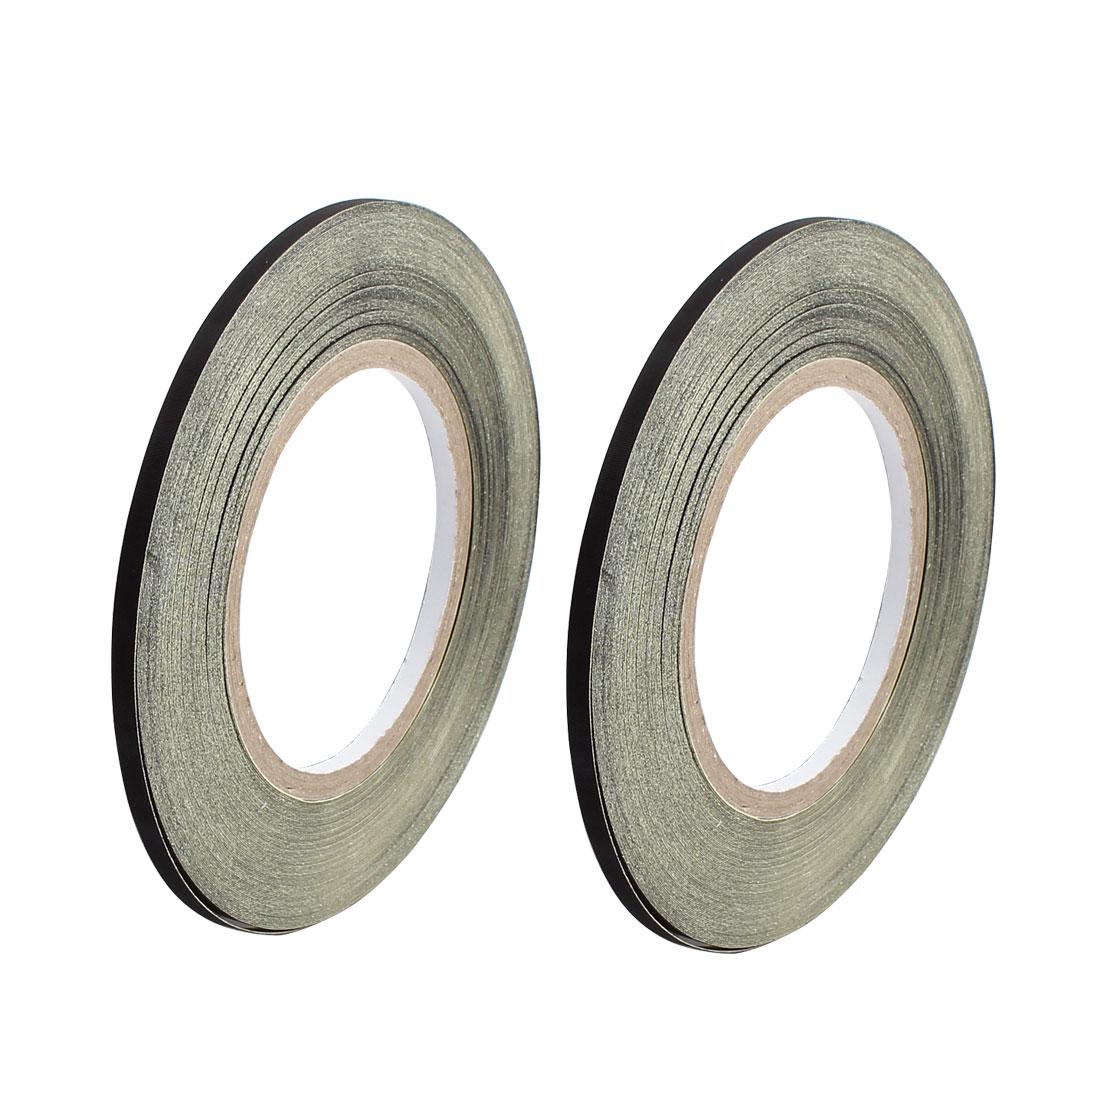 2pcs 5mm x 30M Black Insulating Acetate Cloth Adhesive Tape PC Electric Repair